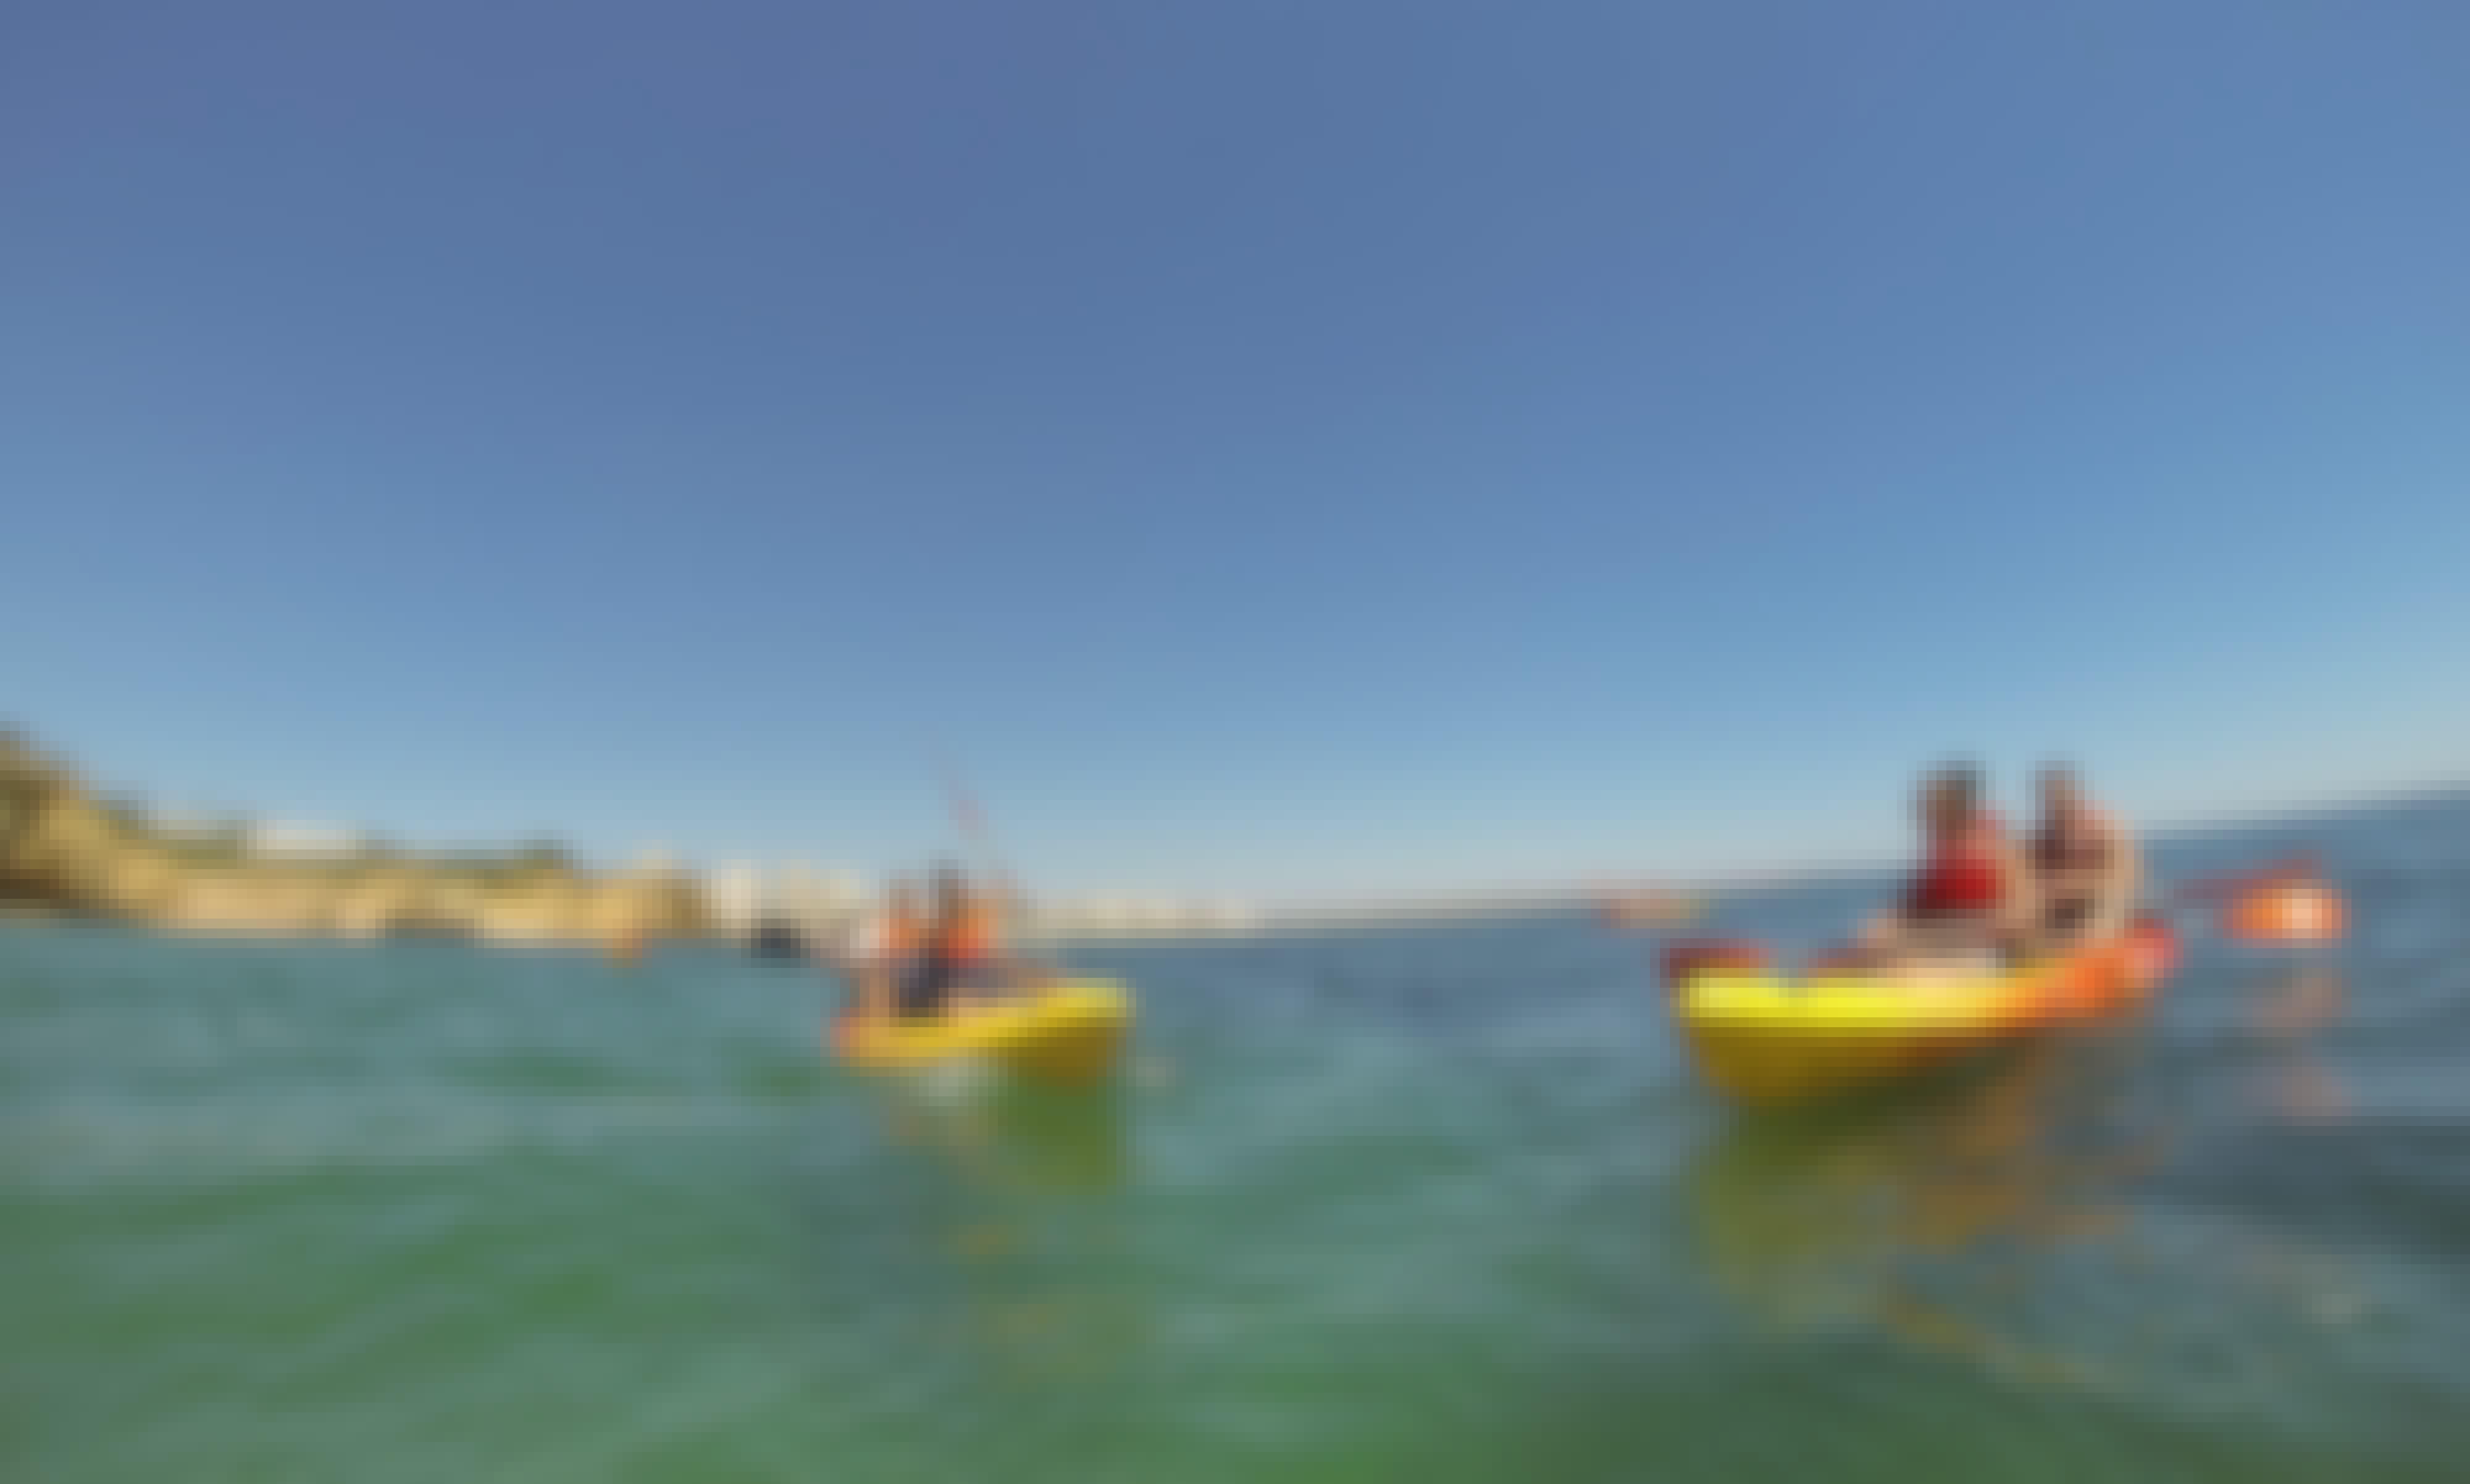 Kayak Rental in Armação de Pêra Beach, Algarve, Portugal